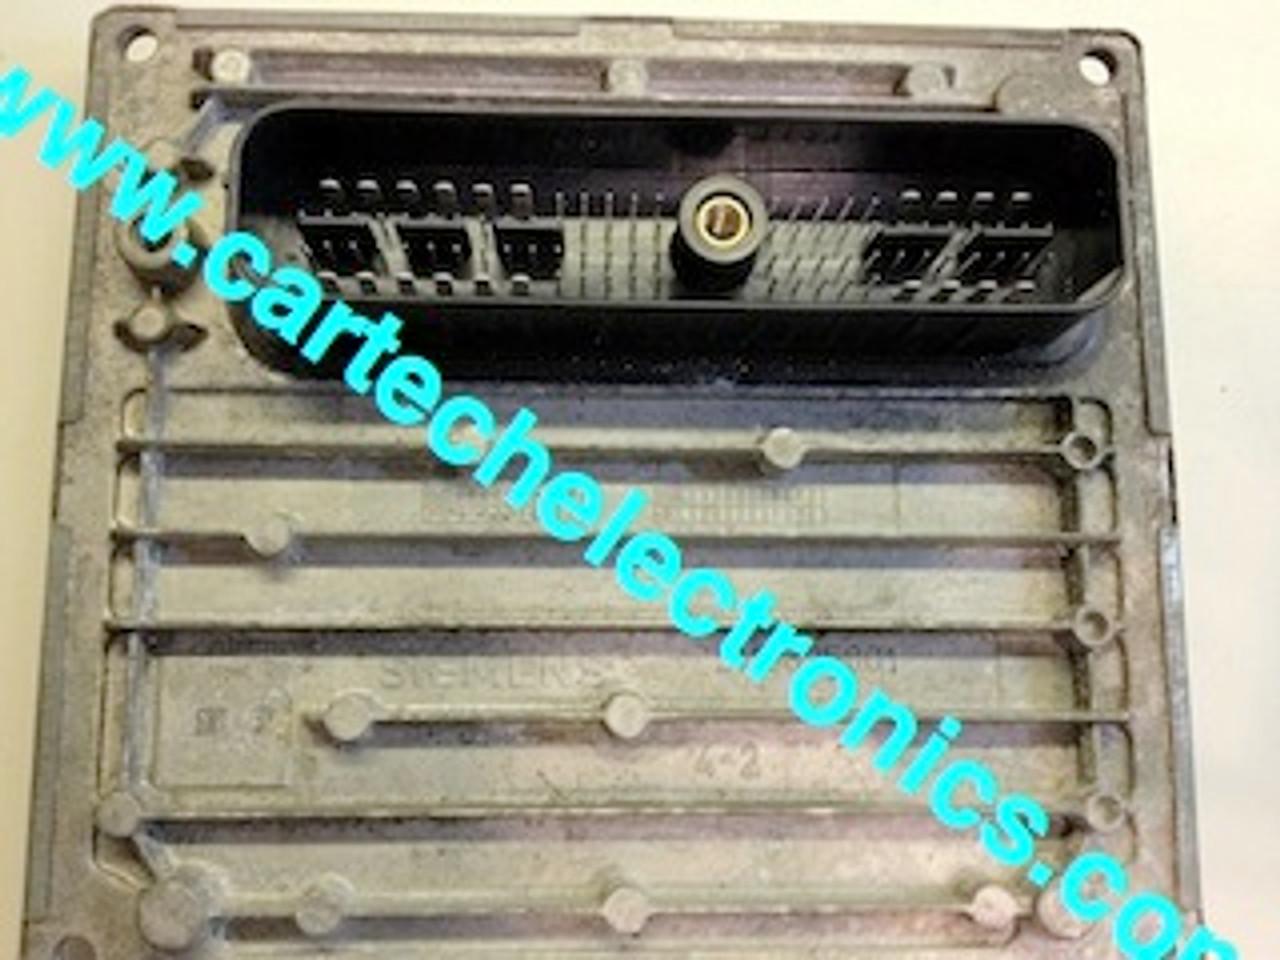 Plug & Play Engine ECU Siemens 4S61-12A650-NA S120977013 A SIM210